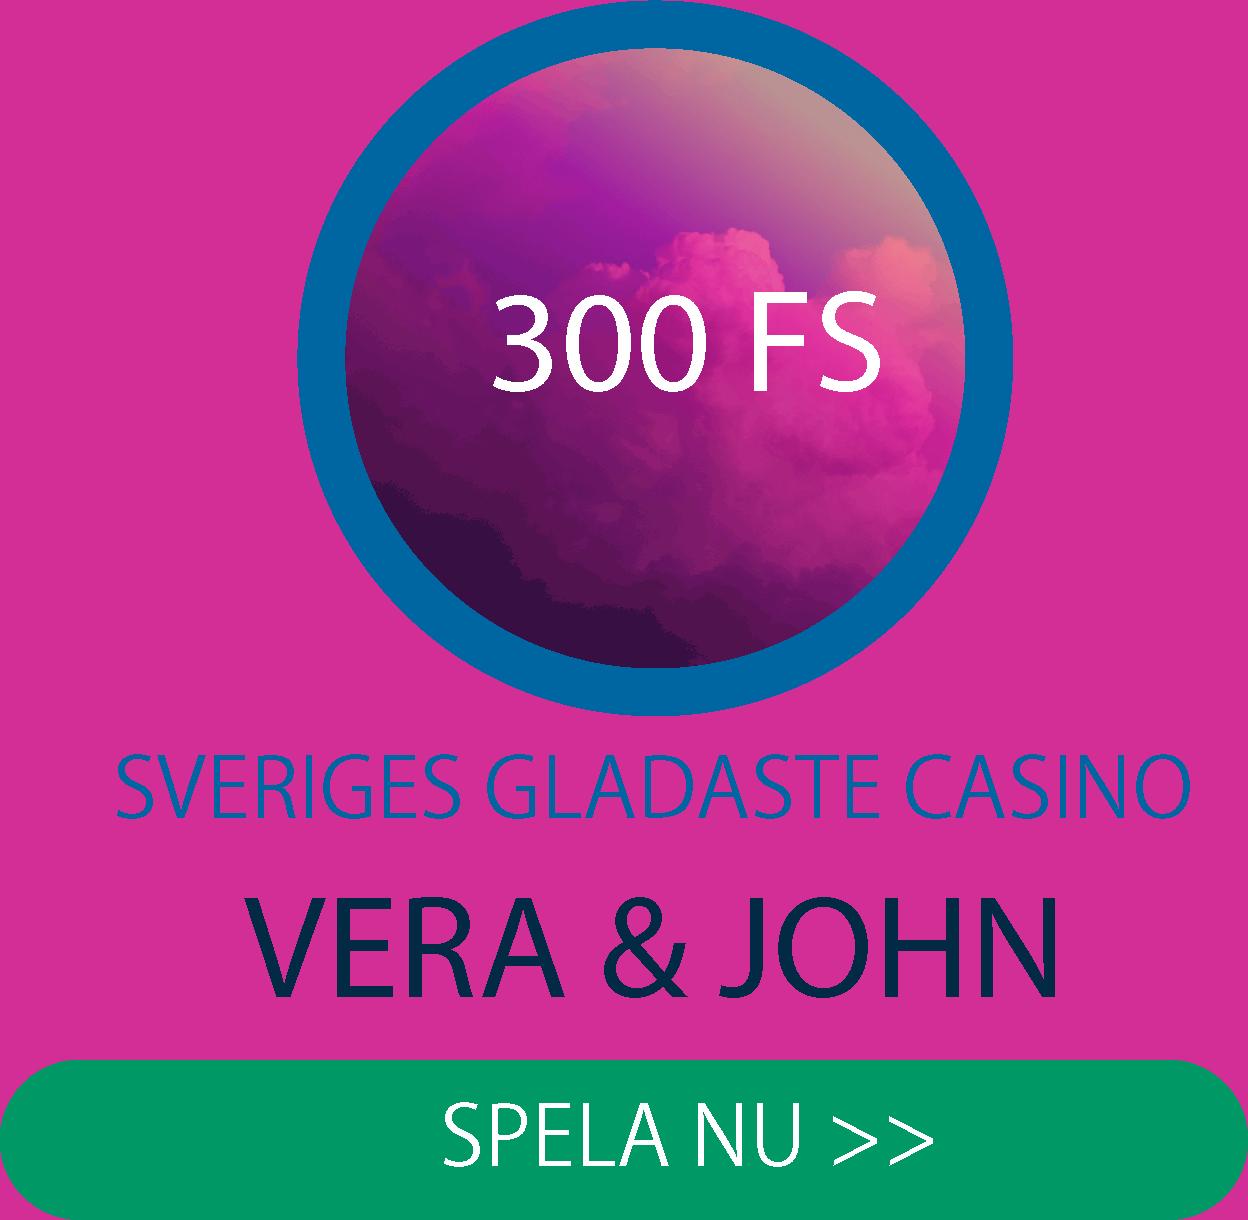 Casinobonusar i Vera&Johns shop